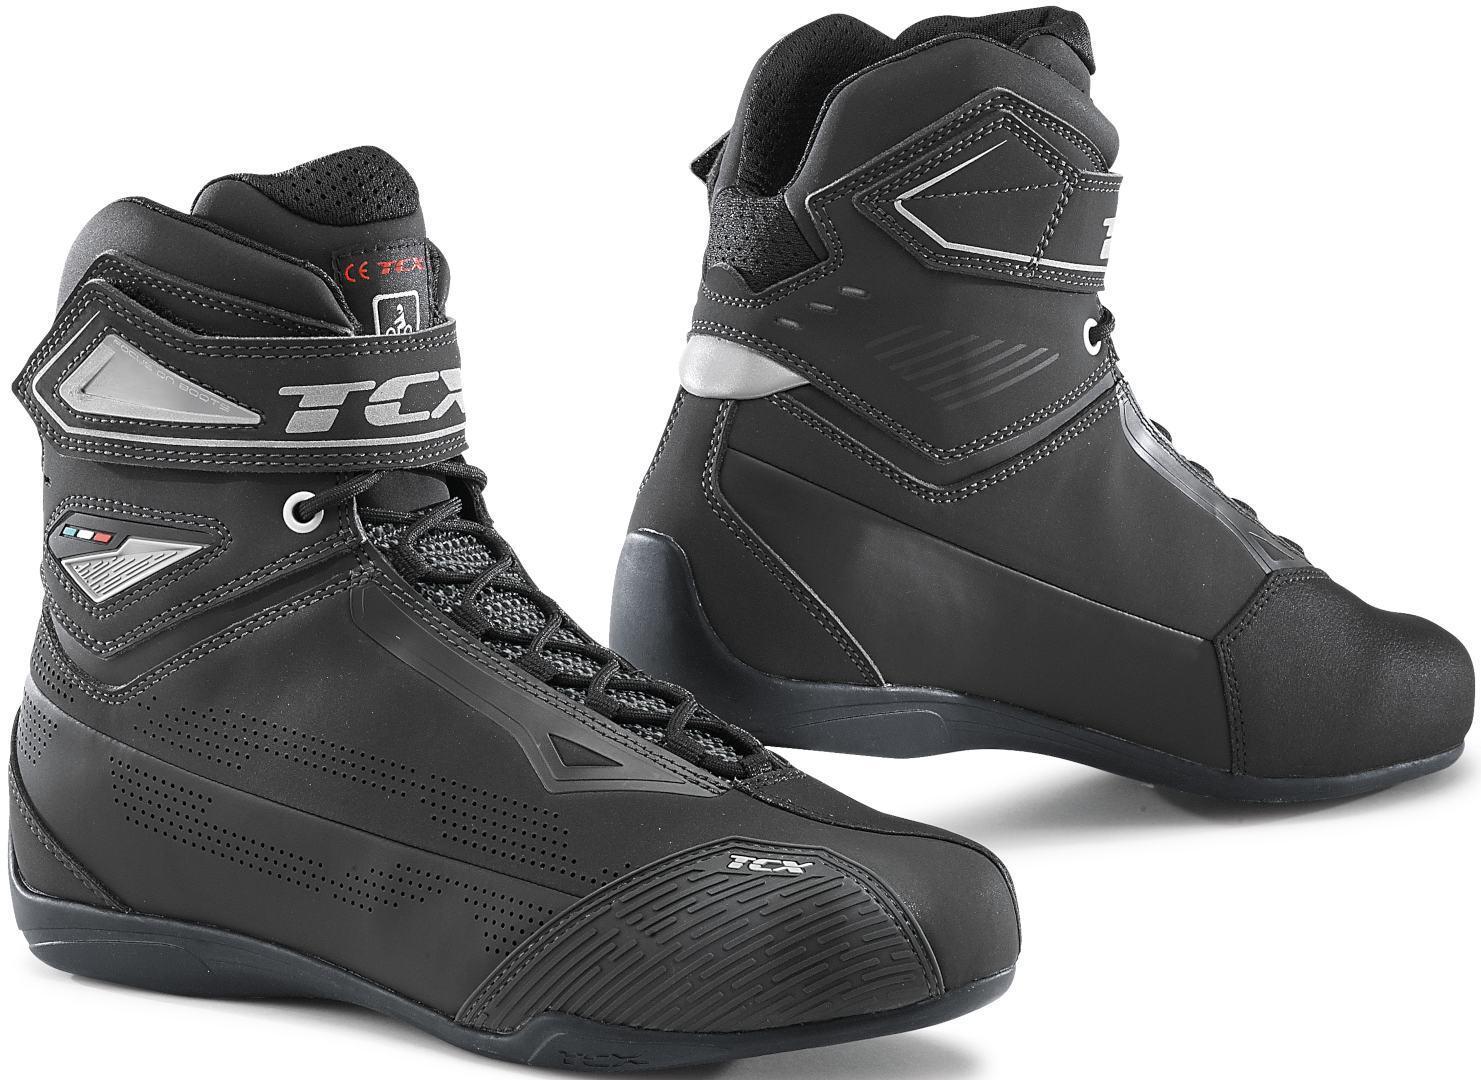 TCX Rush 2 Air perforierte Motorradschuhe, grau, Größe 38, grau, Größe 38